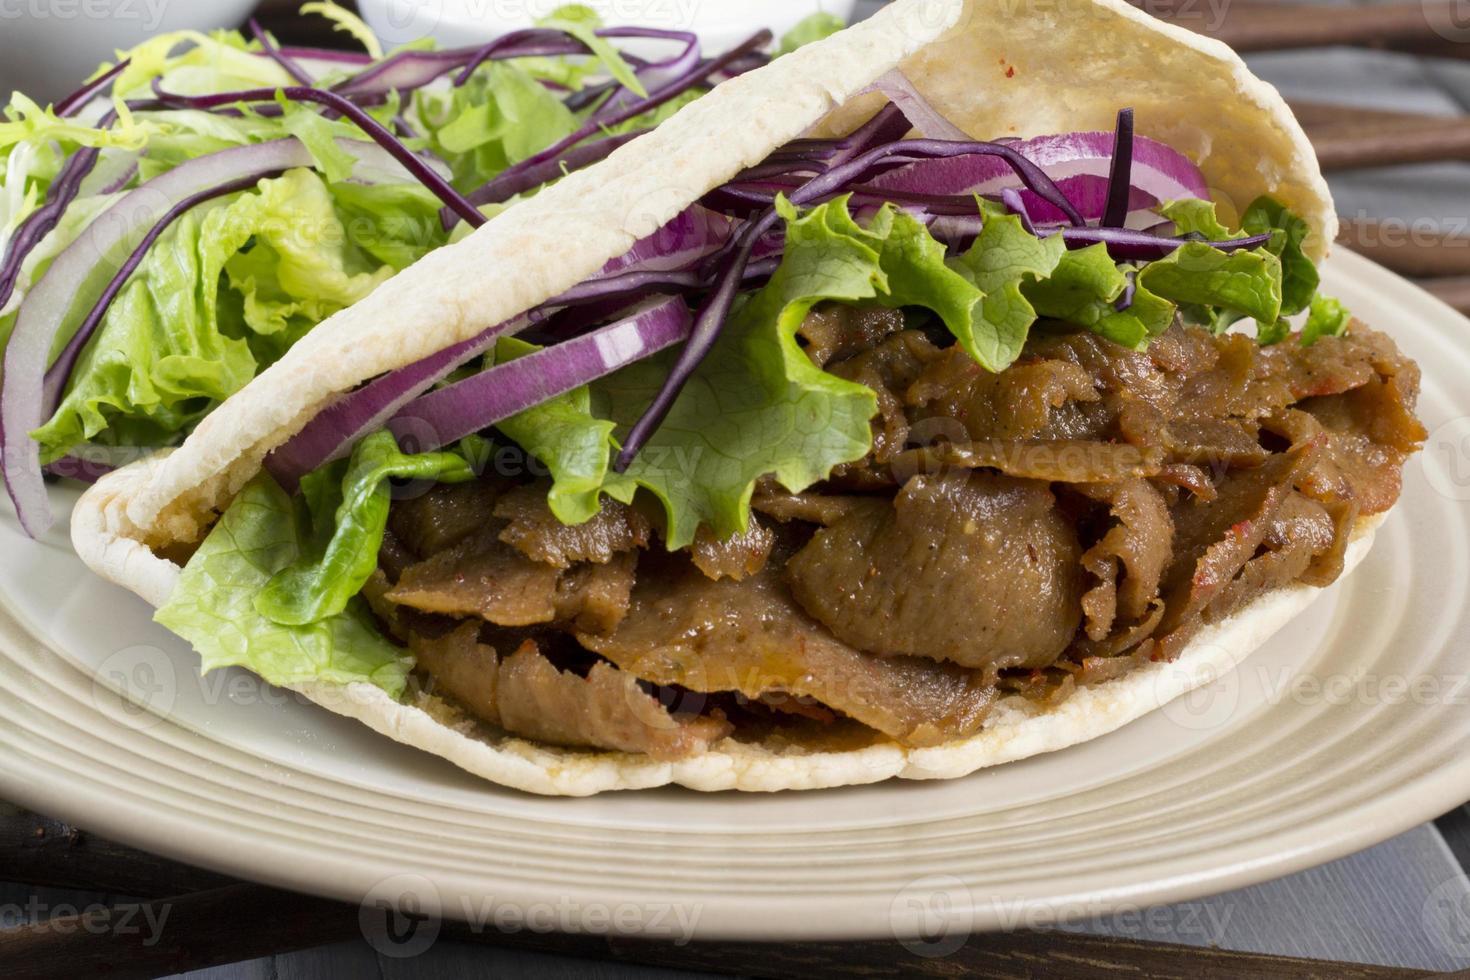 donner kebab / gyro photo